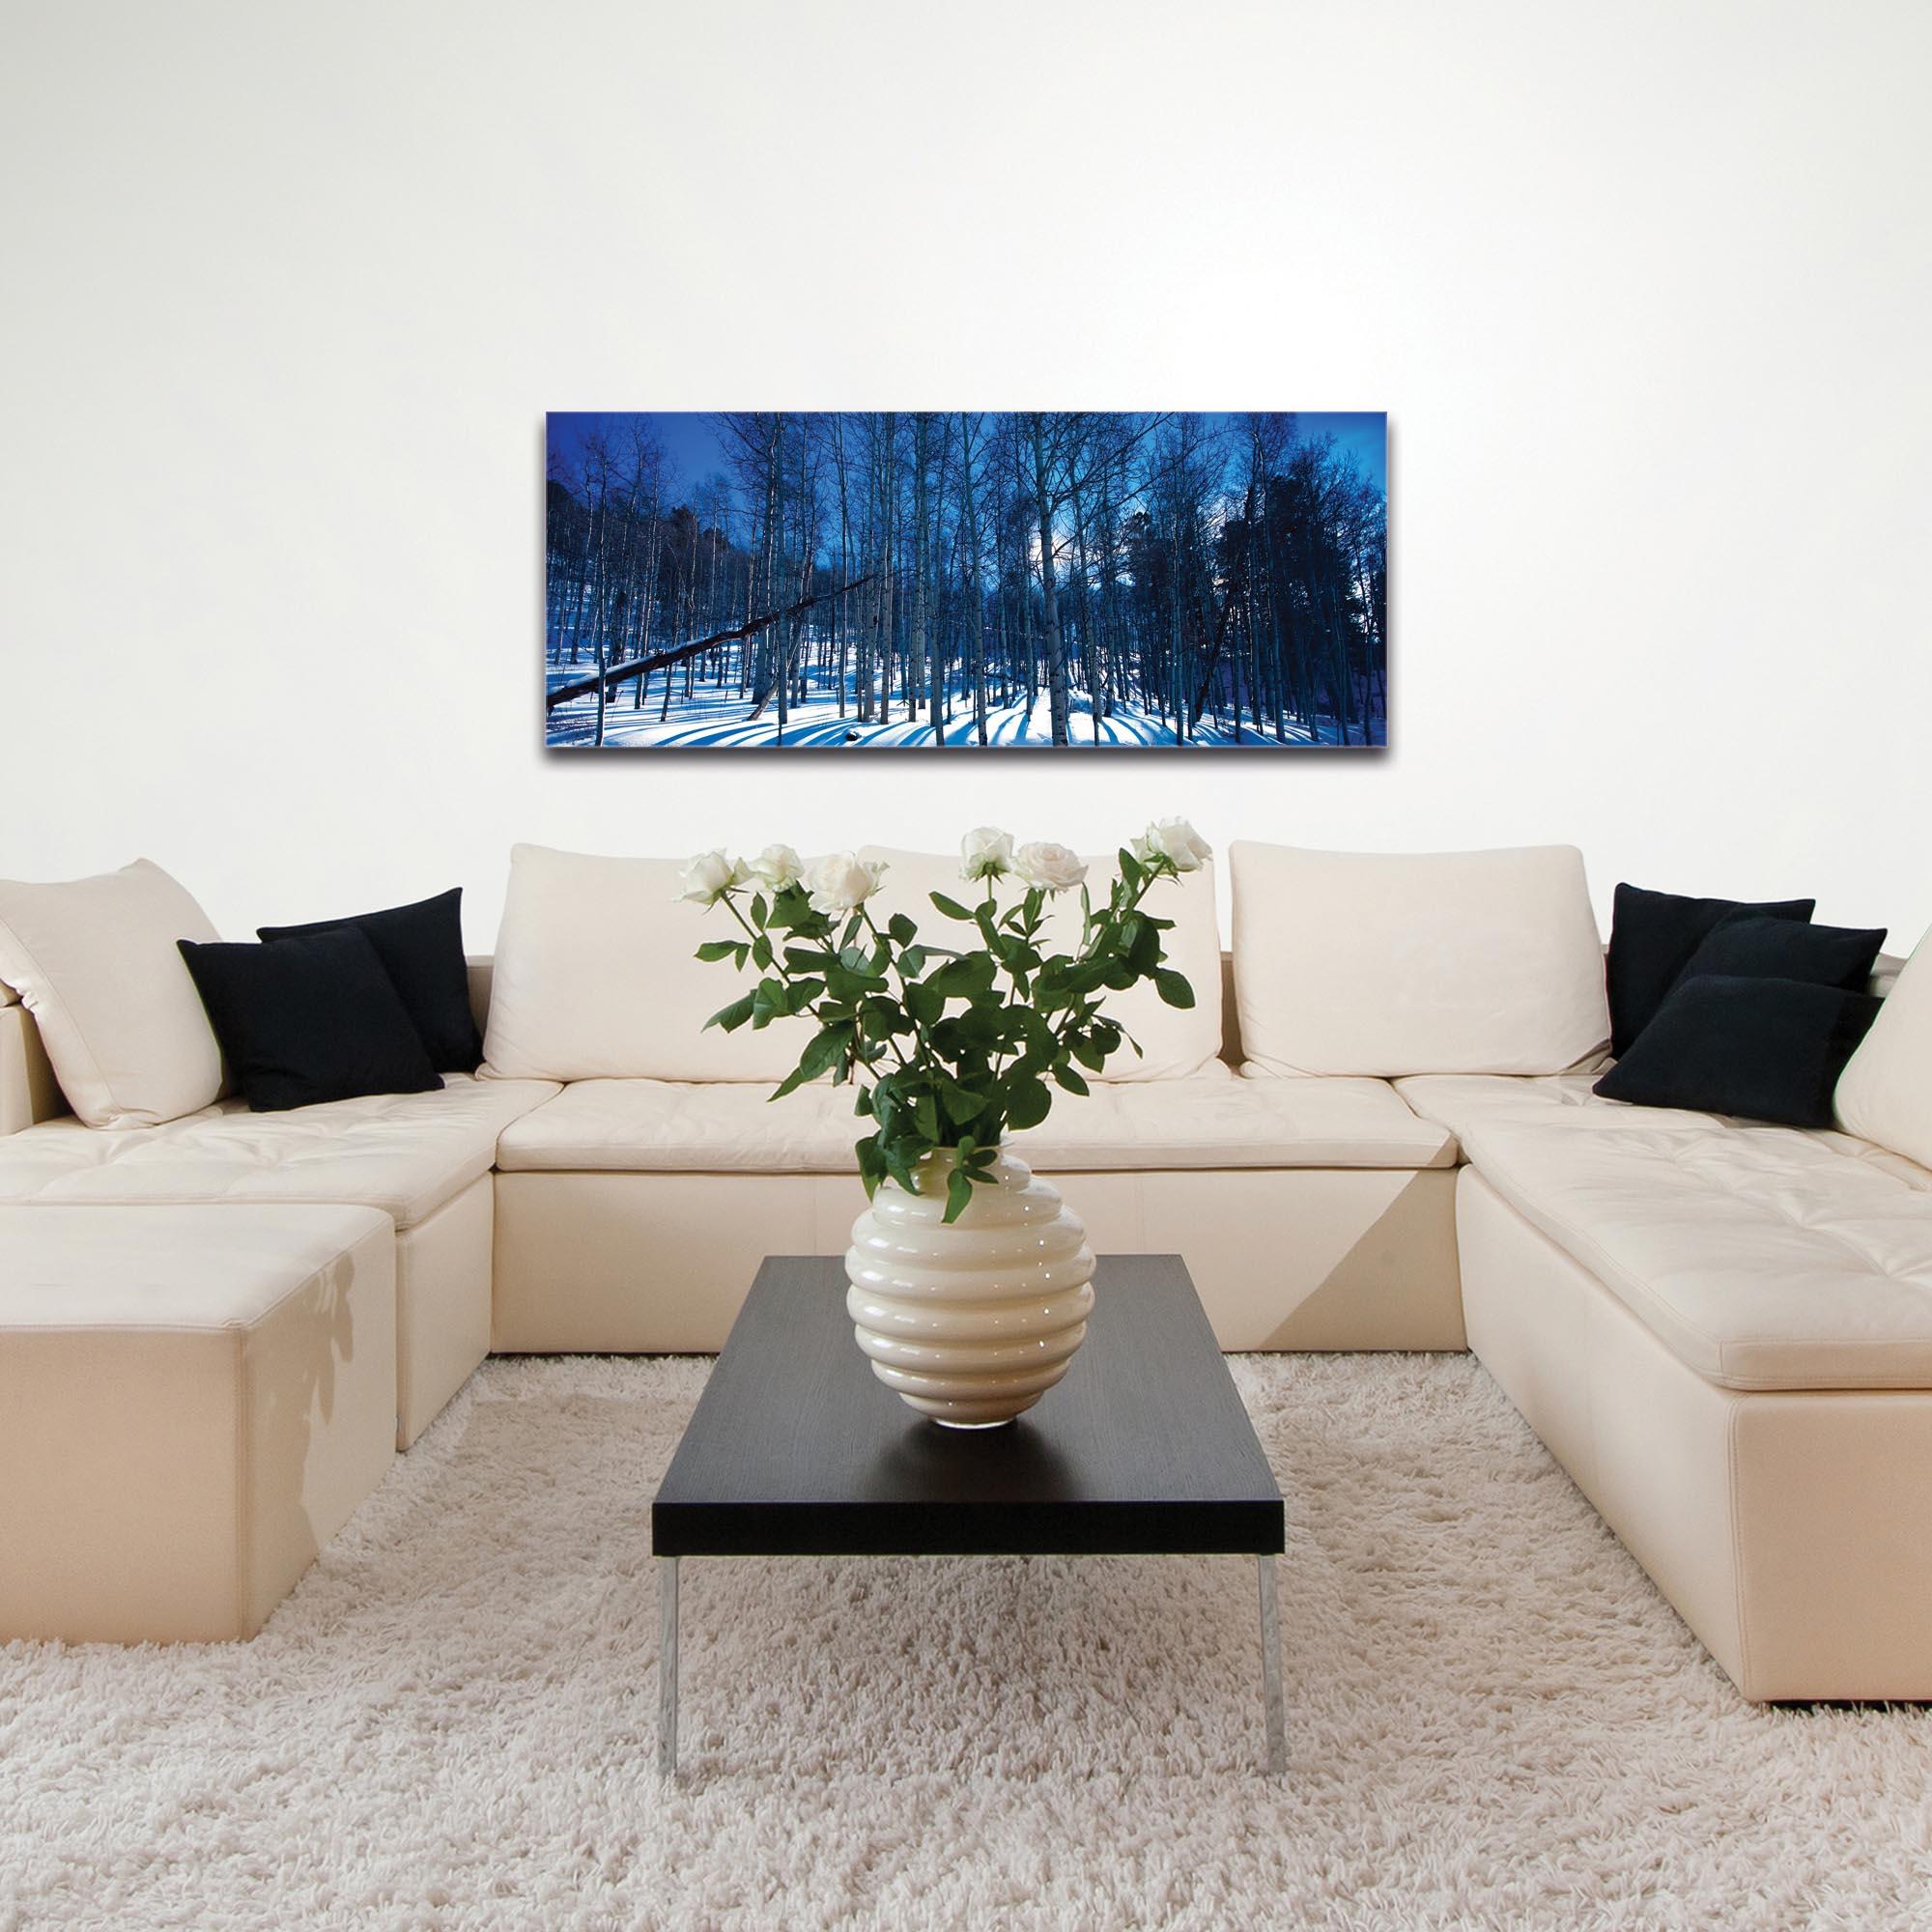 Landscape Photography 'Aspen Blues' - Winter Scene Art on Metal or Plexiglass - Image 3